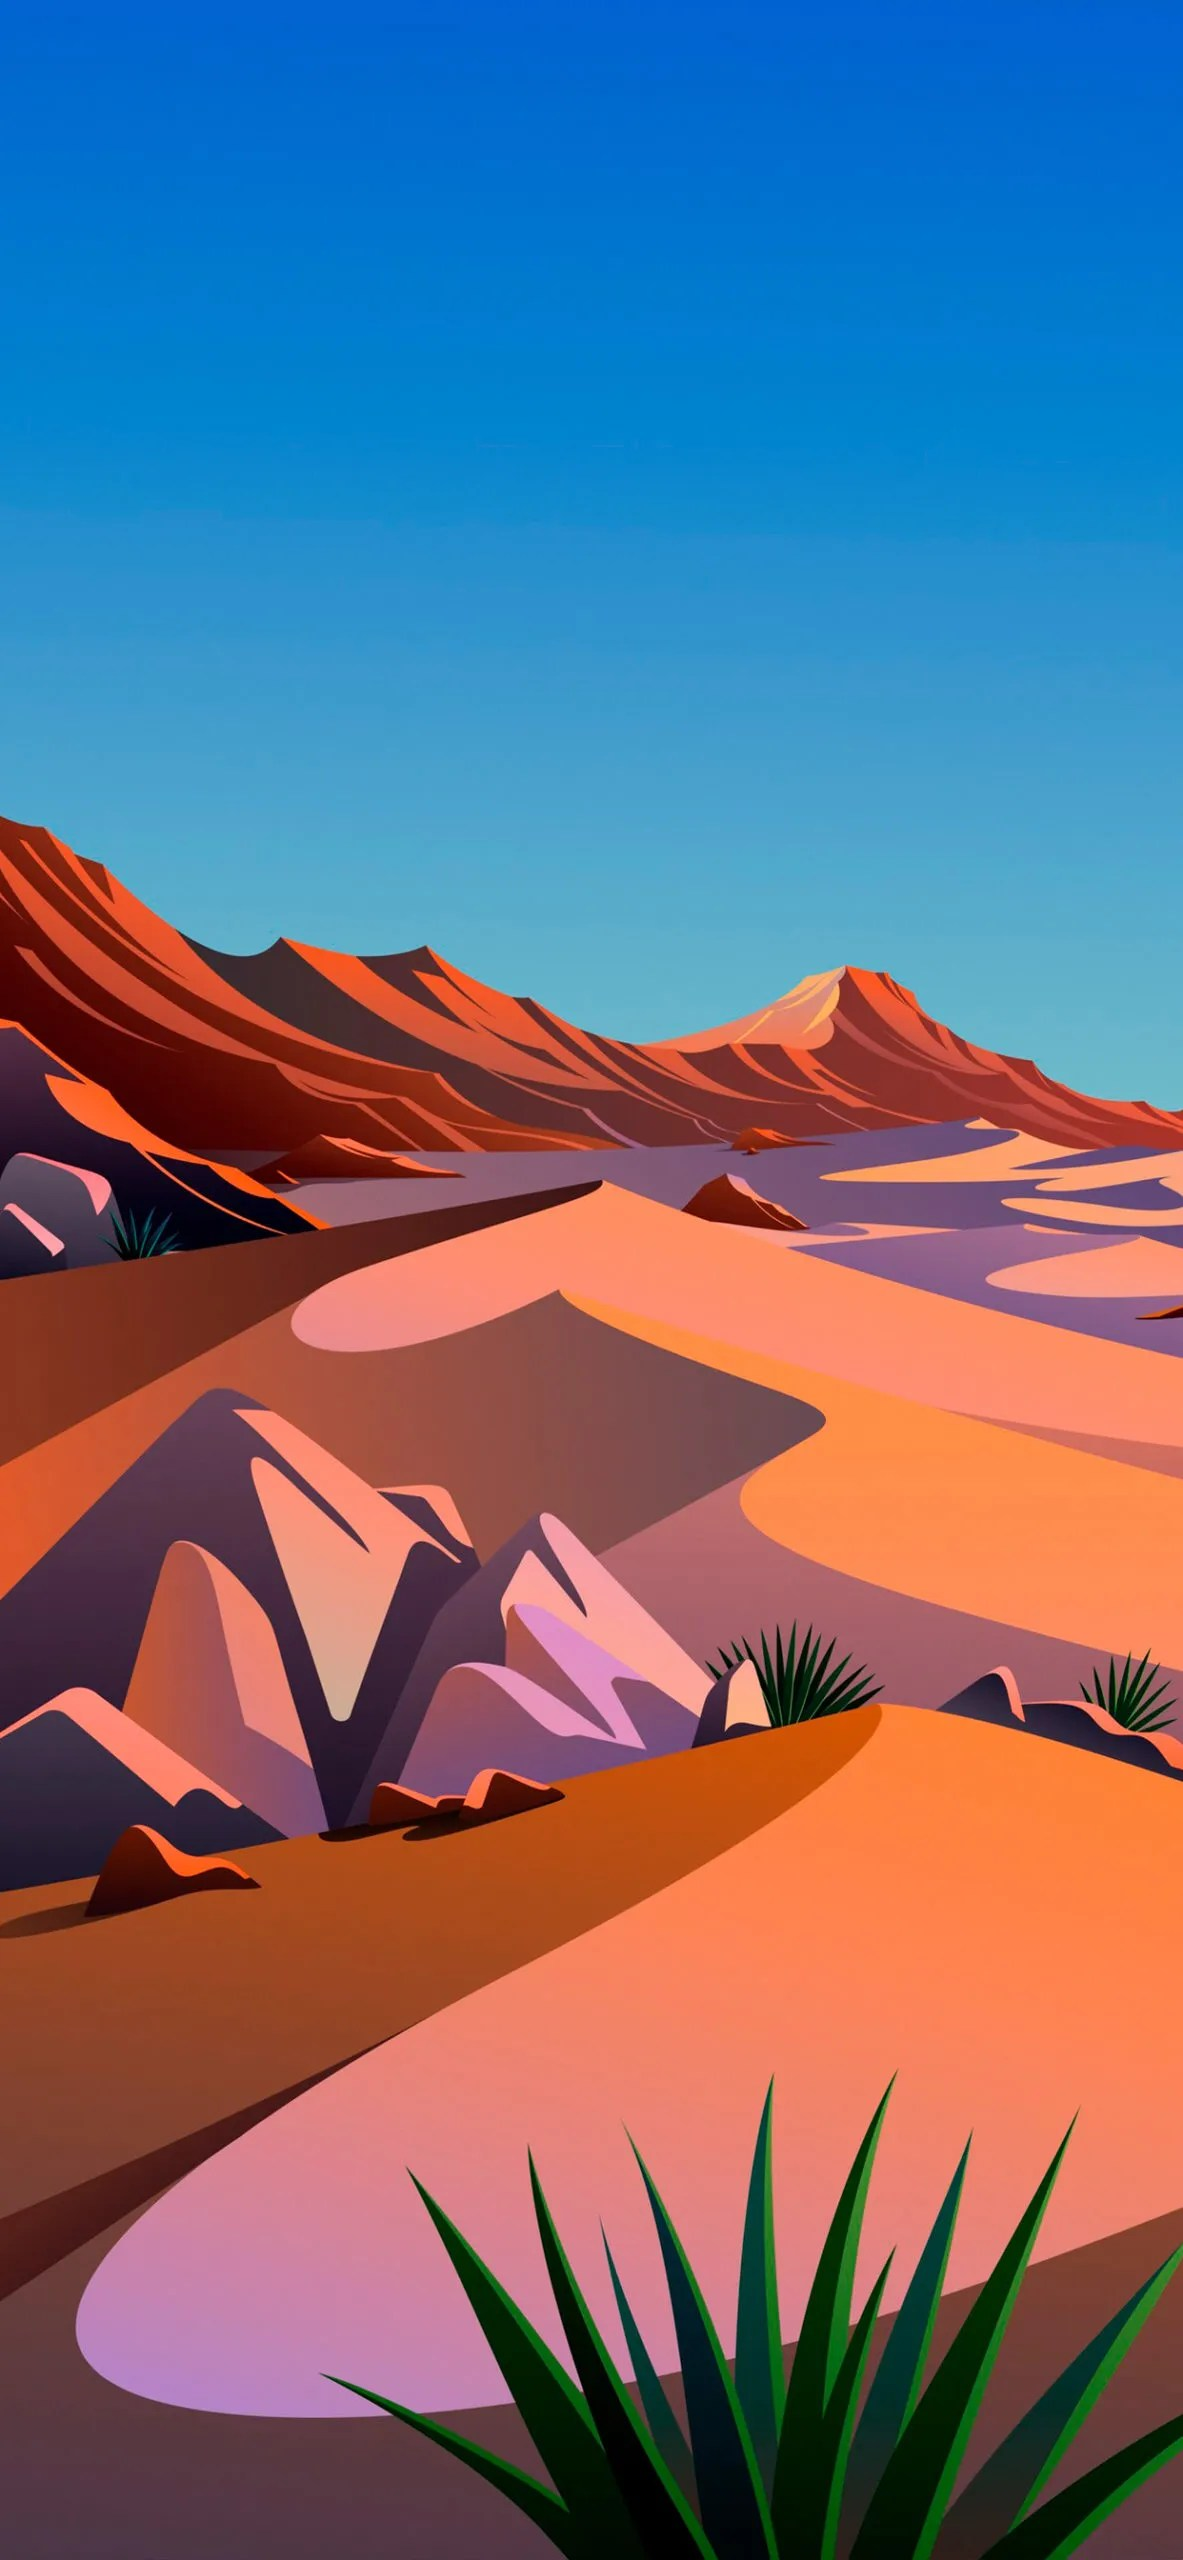 iphone wallpaper big sur desert3 scaled Mac OS Big Sur (Desert)